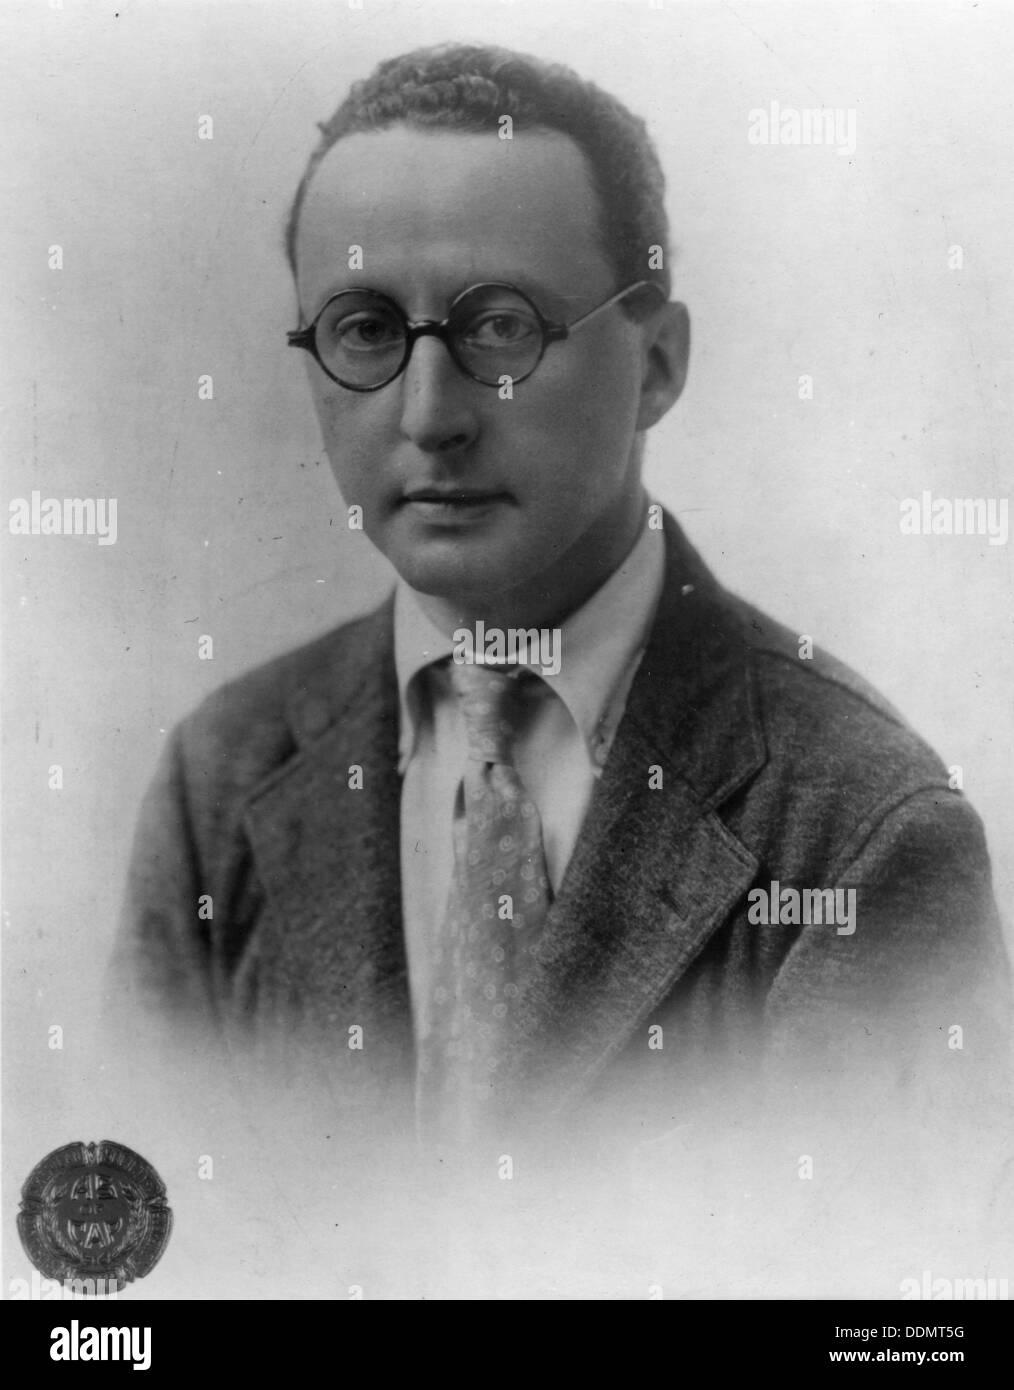 Jerome Kern (1885-1945), American composer. - Stock Image